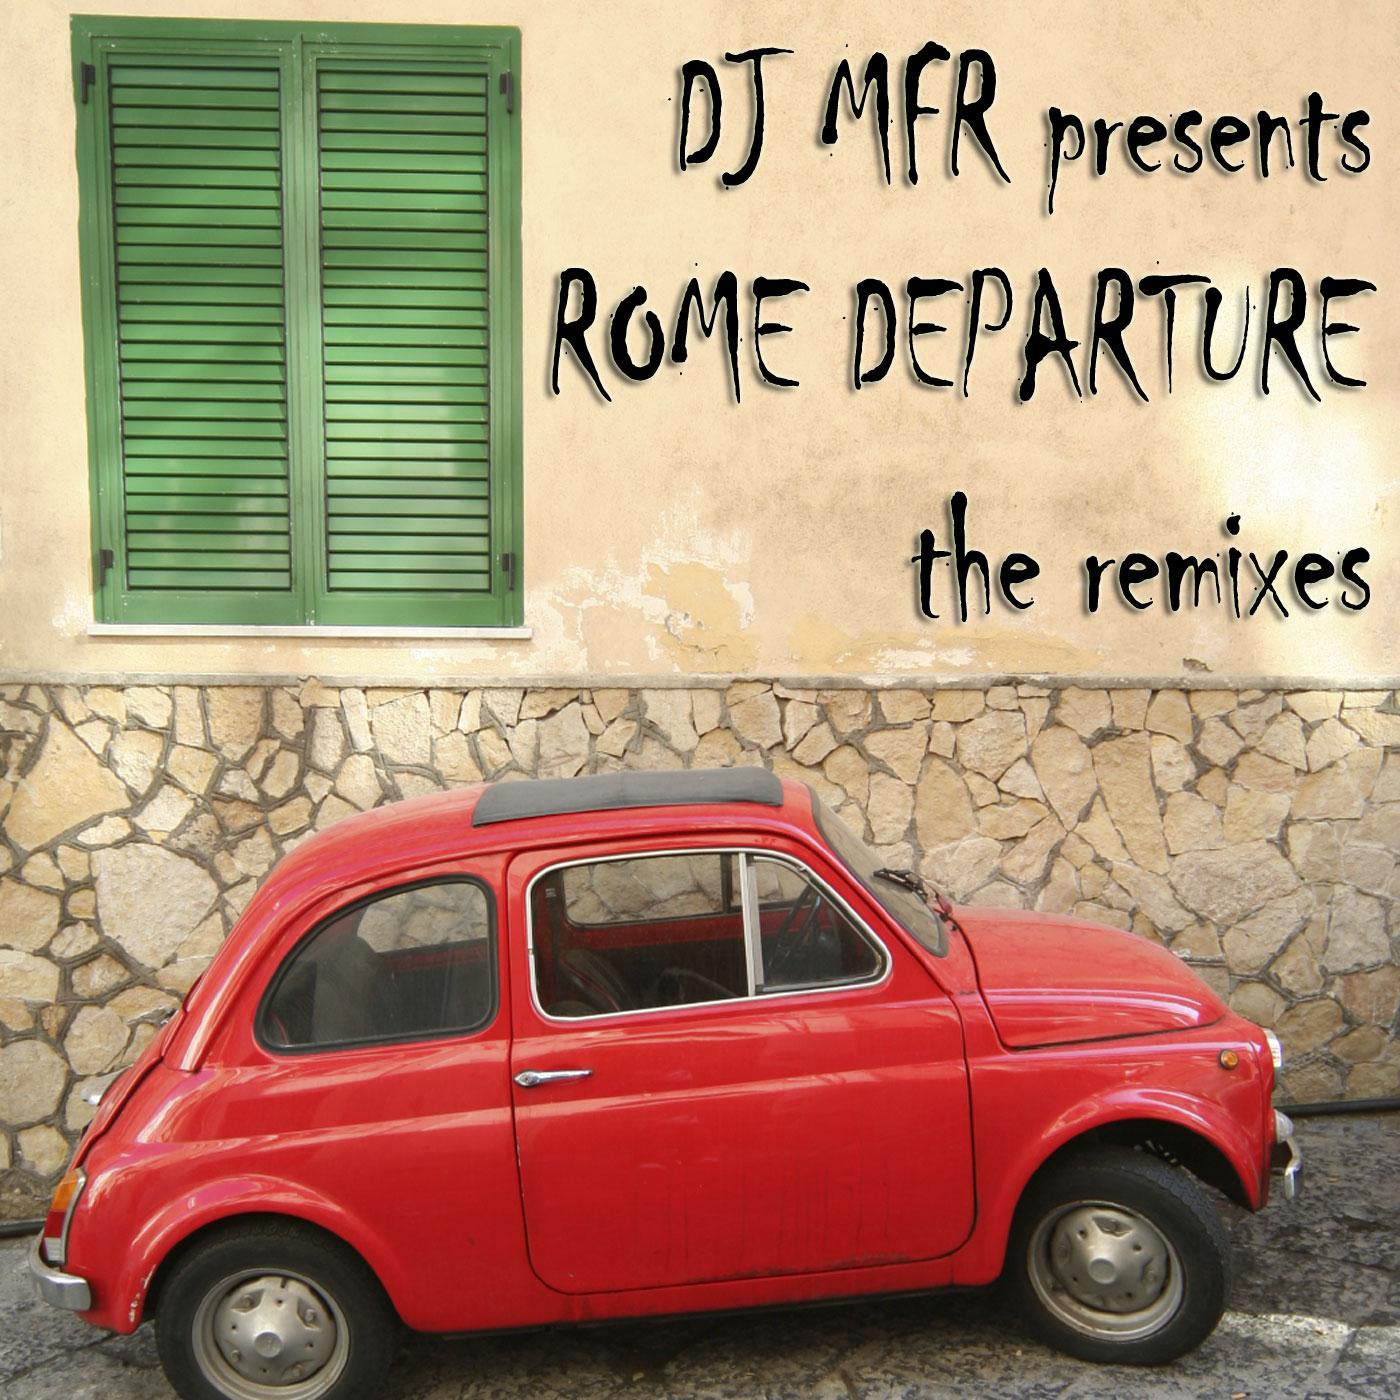 Rome Departure Remixes